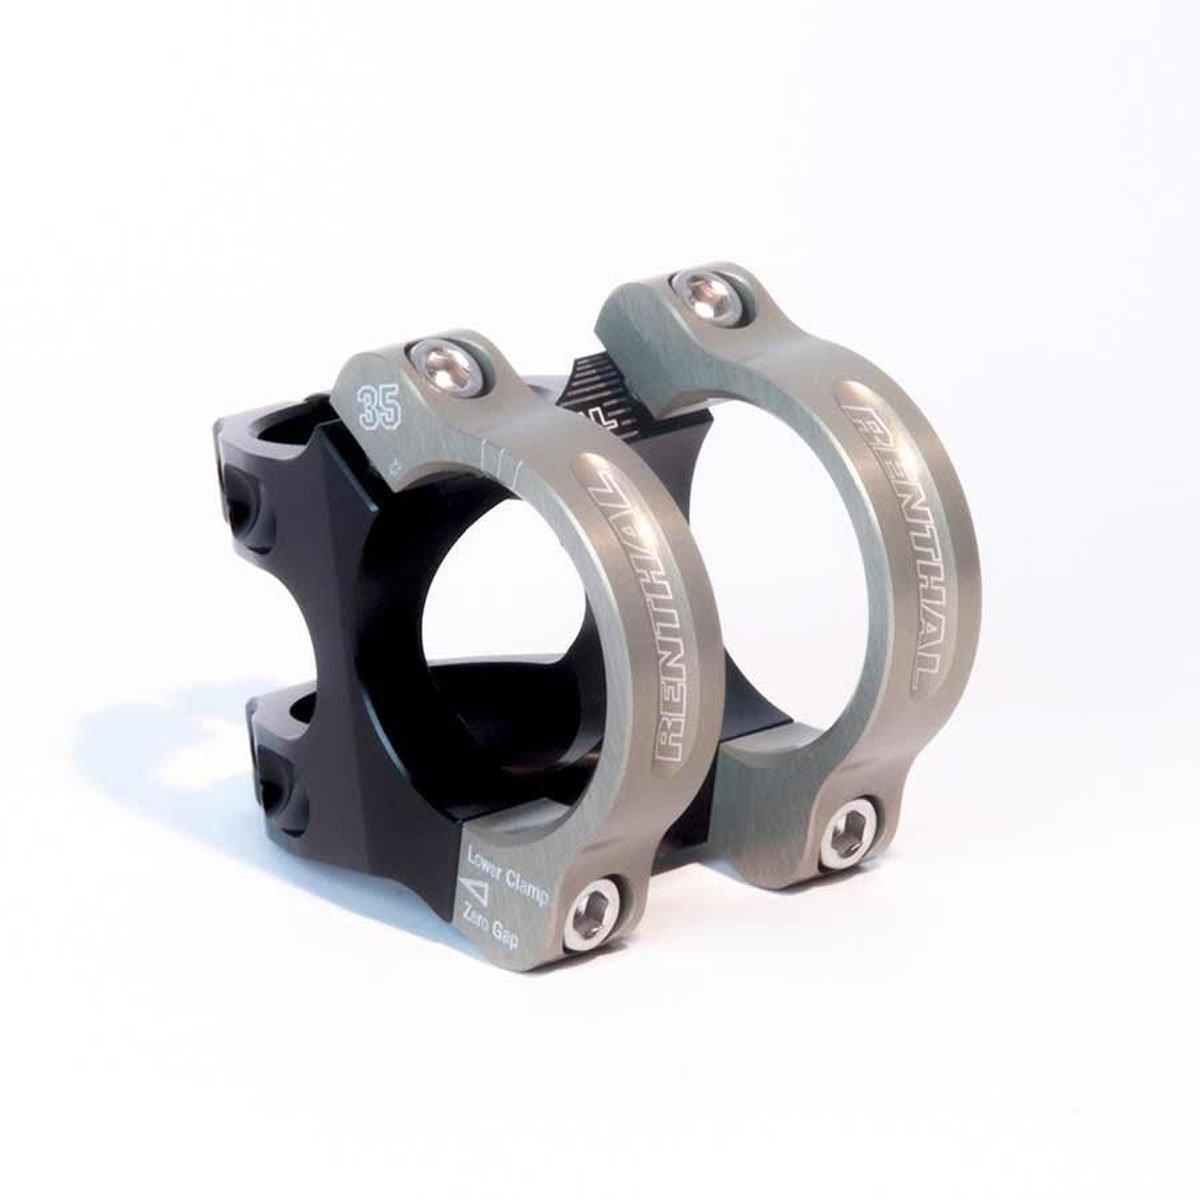 Renthal MTB-Vorbau Apex Gold Schwarz, 35.0 mm, 33 mm, 6 Grad